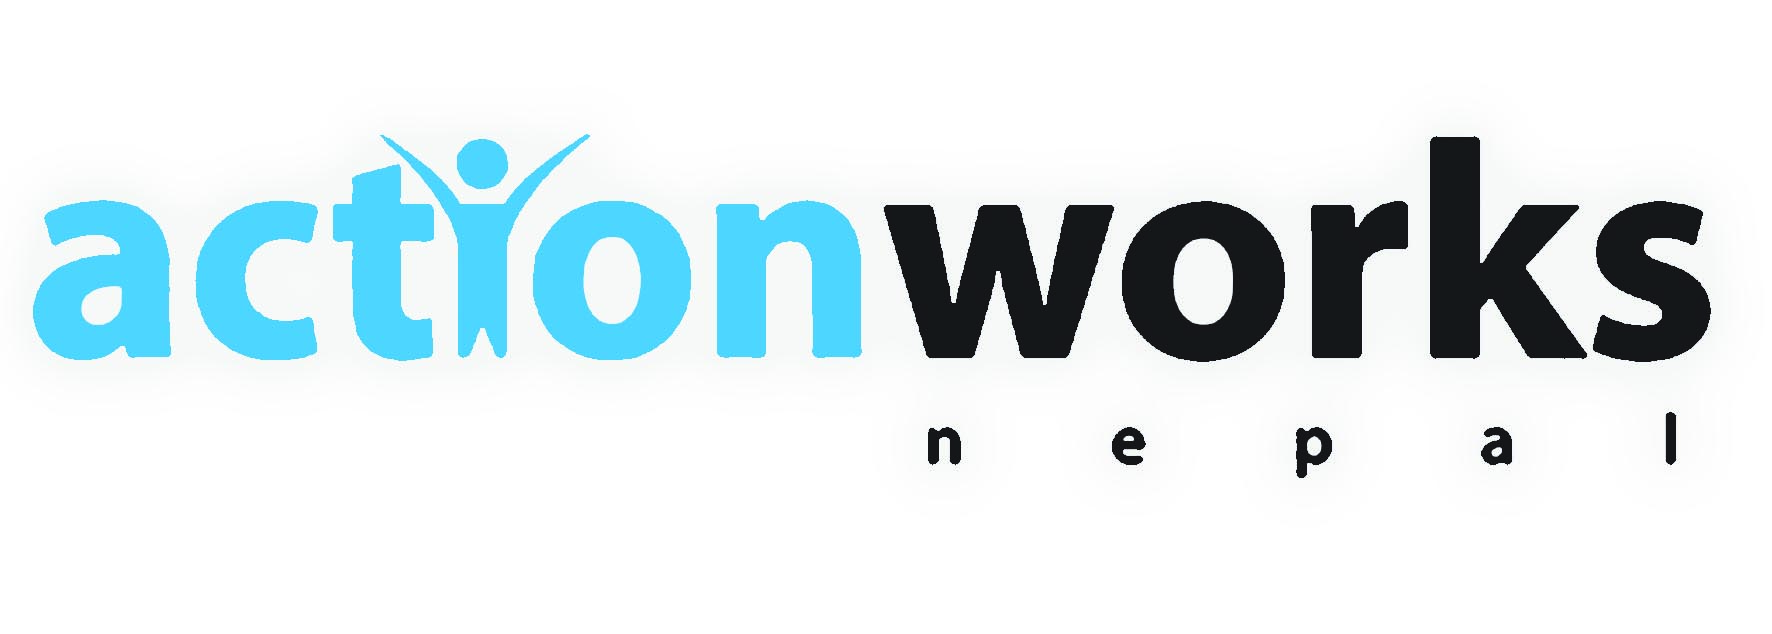 Action work Logo.jpg